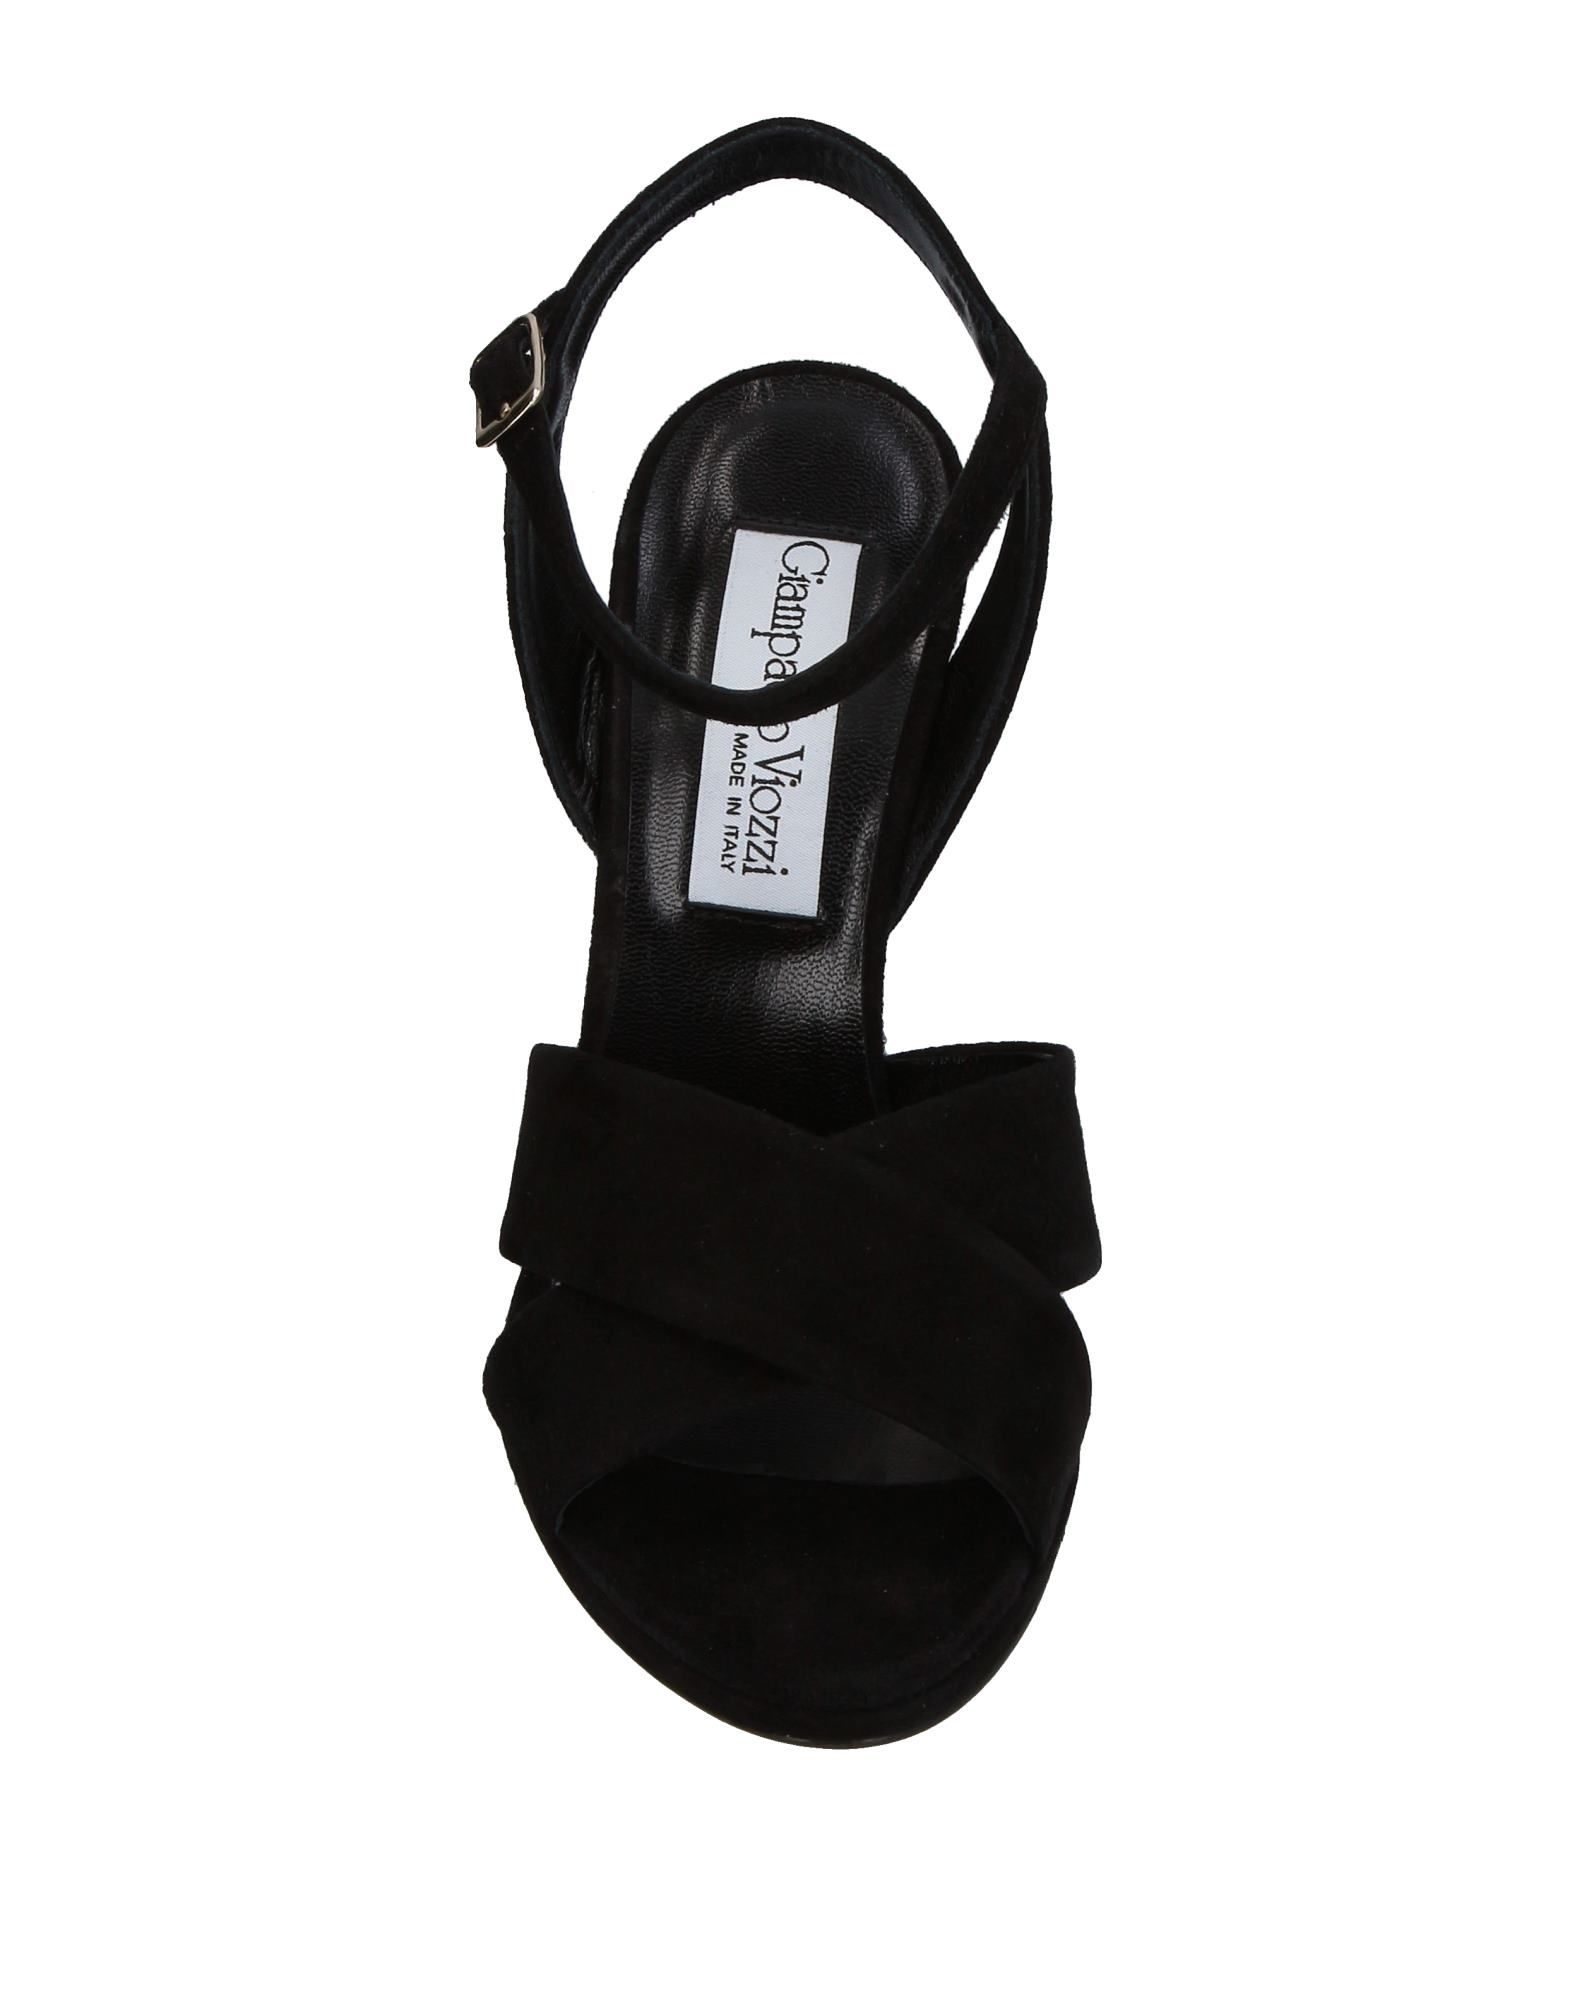 Giampaolo Giampaolo Giampaolo Viozzi Sandalen Damen  11383148XJ Gute Qualität beliebte Schuhe 3c5f21